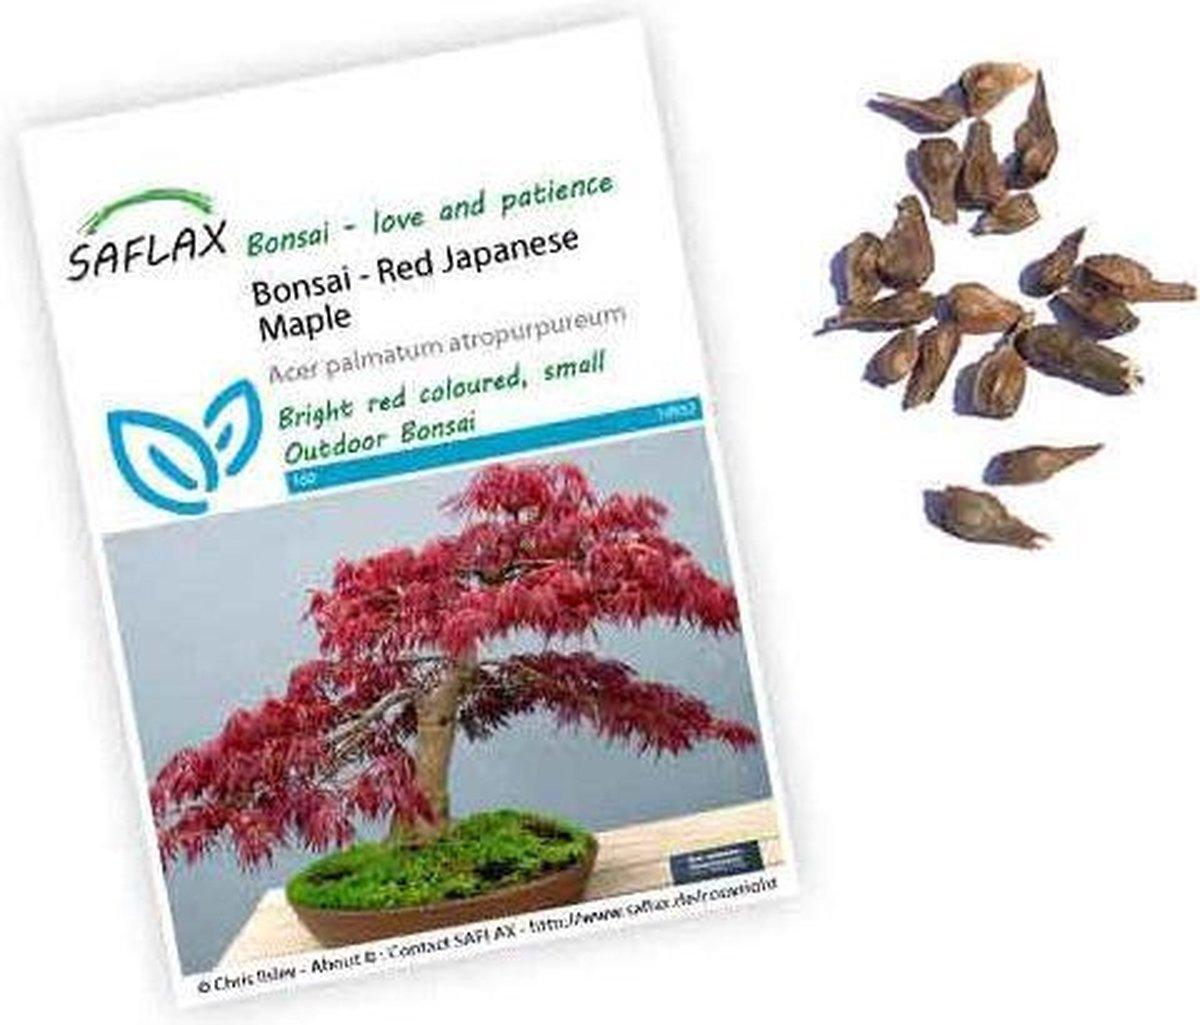 Bol Com Acer Palmatum Atropurpureum Zaden Japanse Esdoorn Bonsai